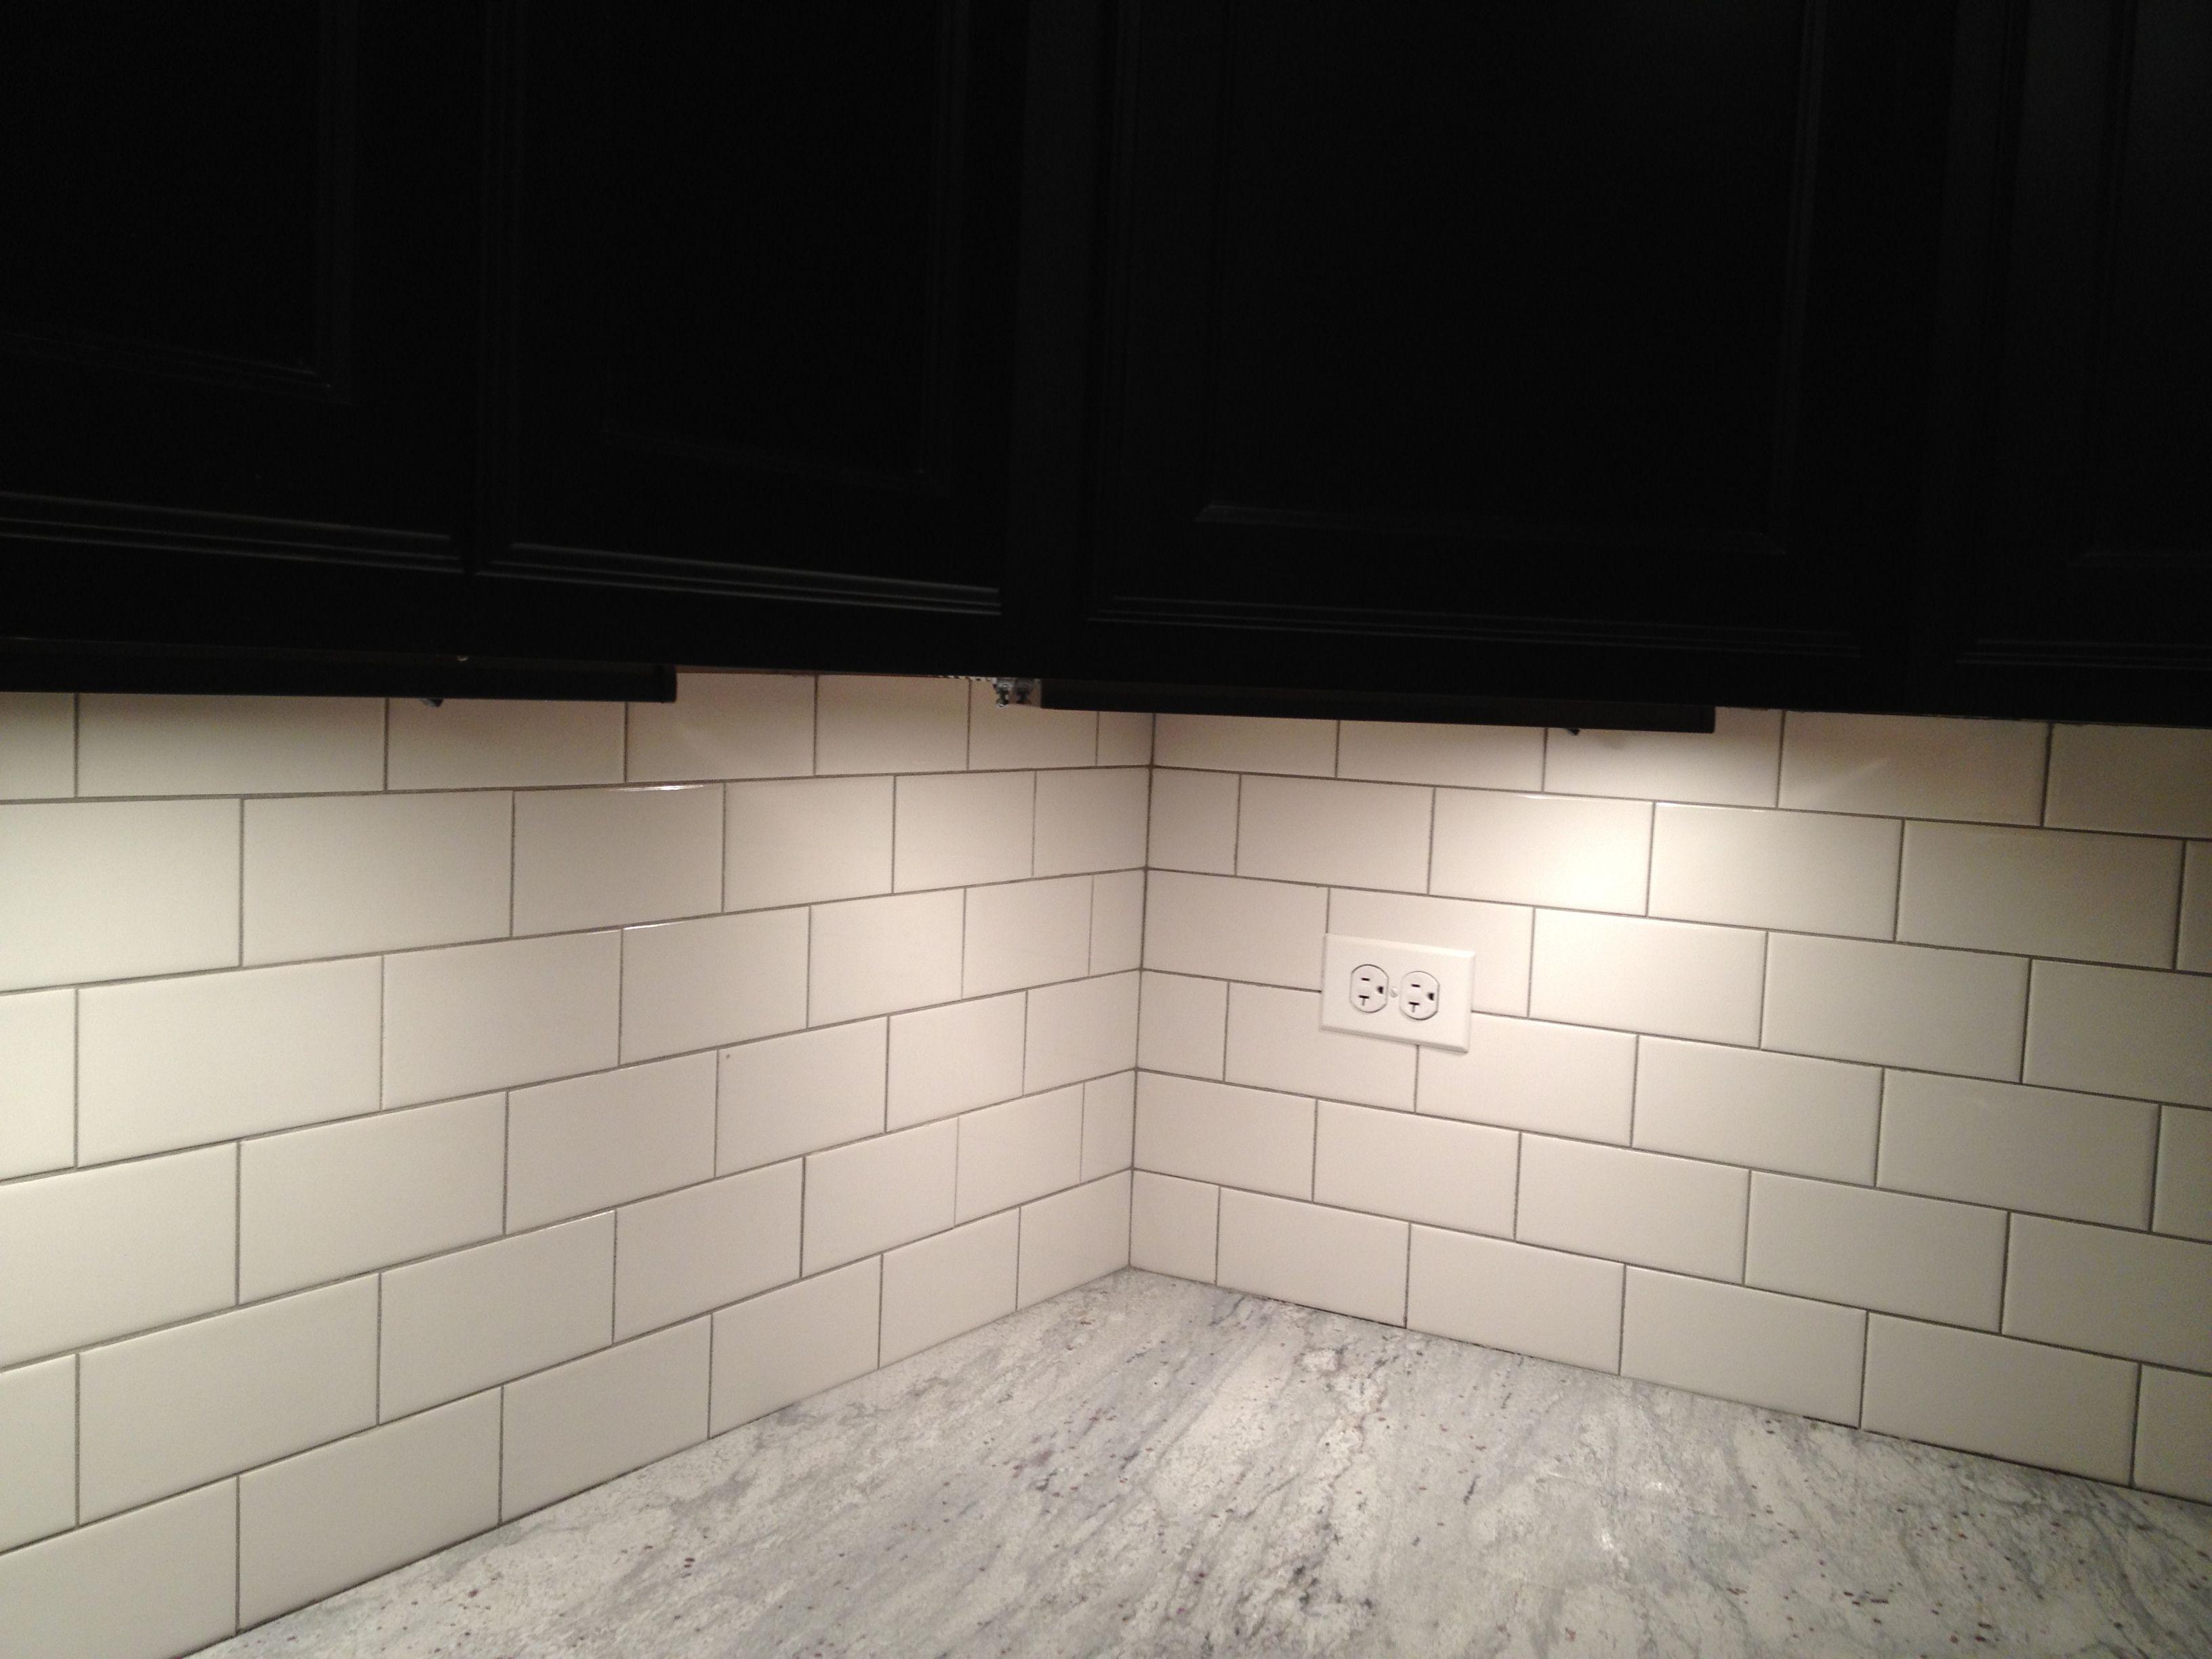 Light Gray Grout With Brick Pattern White Subway Tile Back Splash